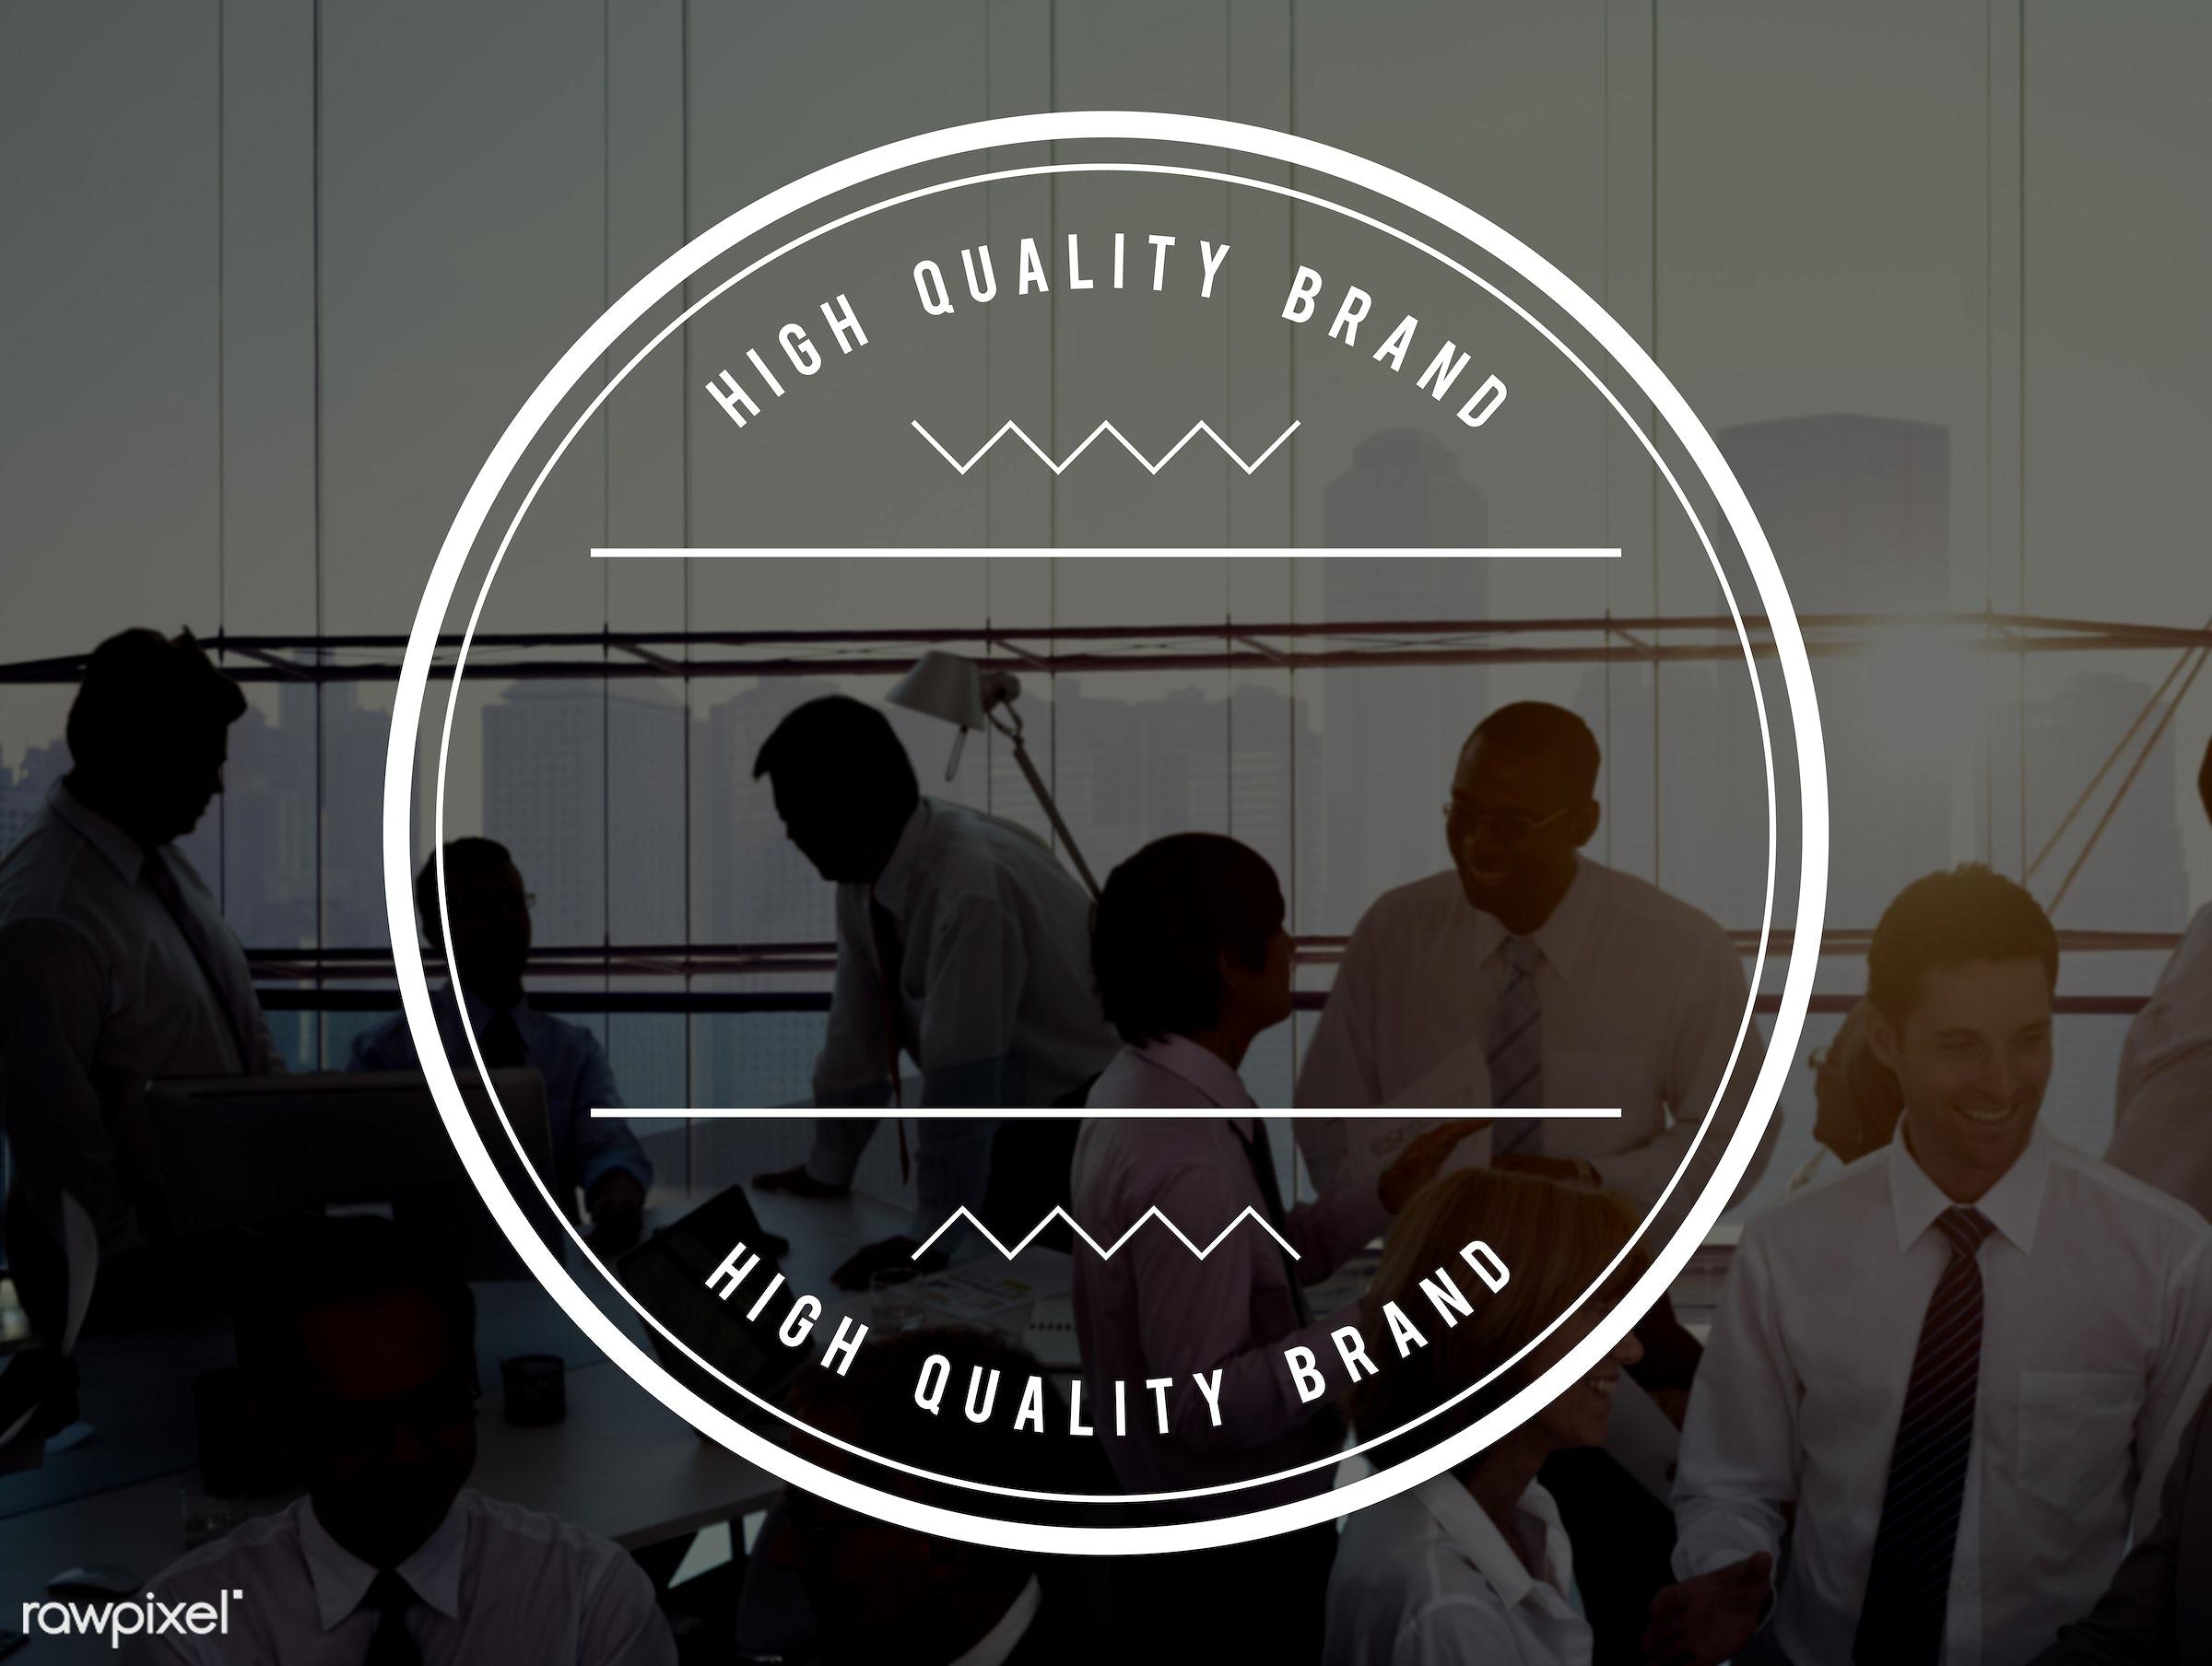 african descent, asian ethnicity, award, badge, best, brand, building, business, businessmen, businesswomen, circle, city,...